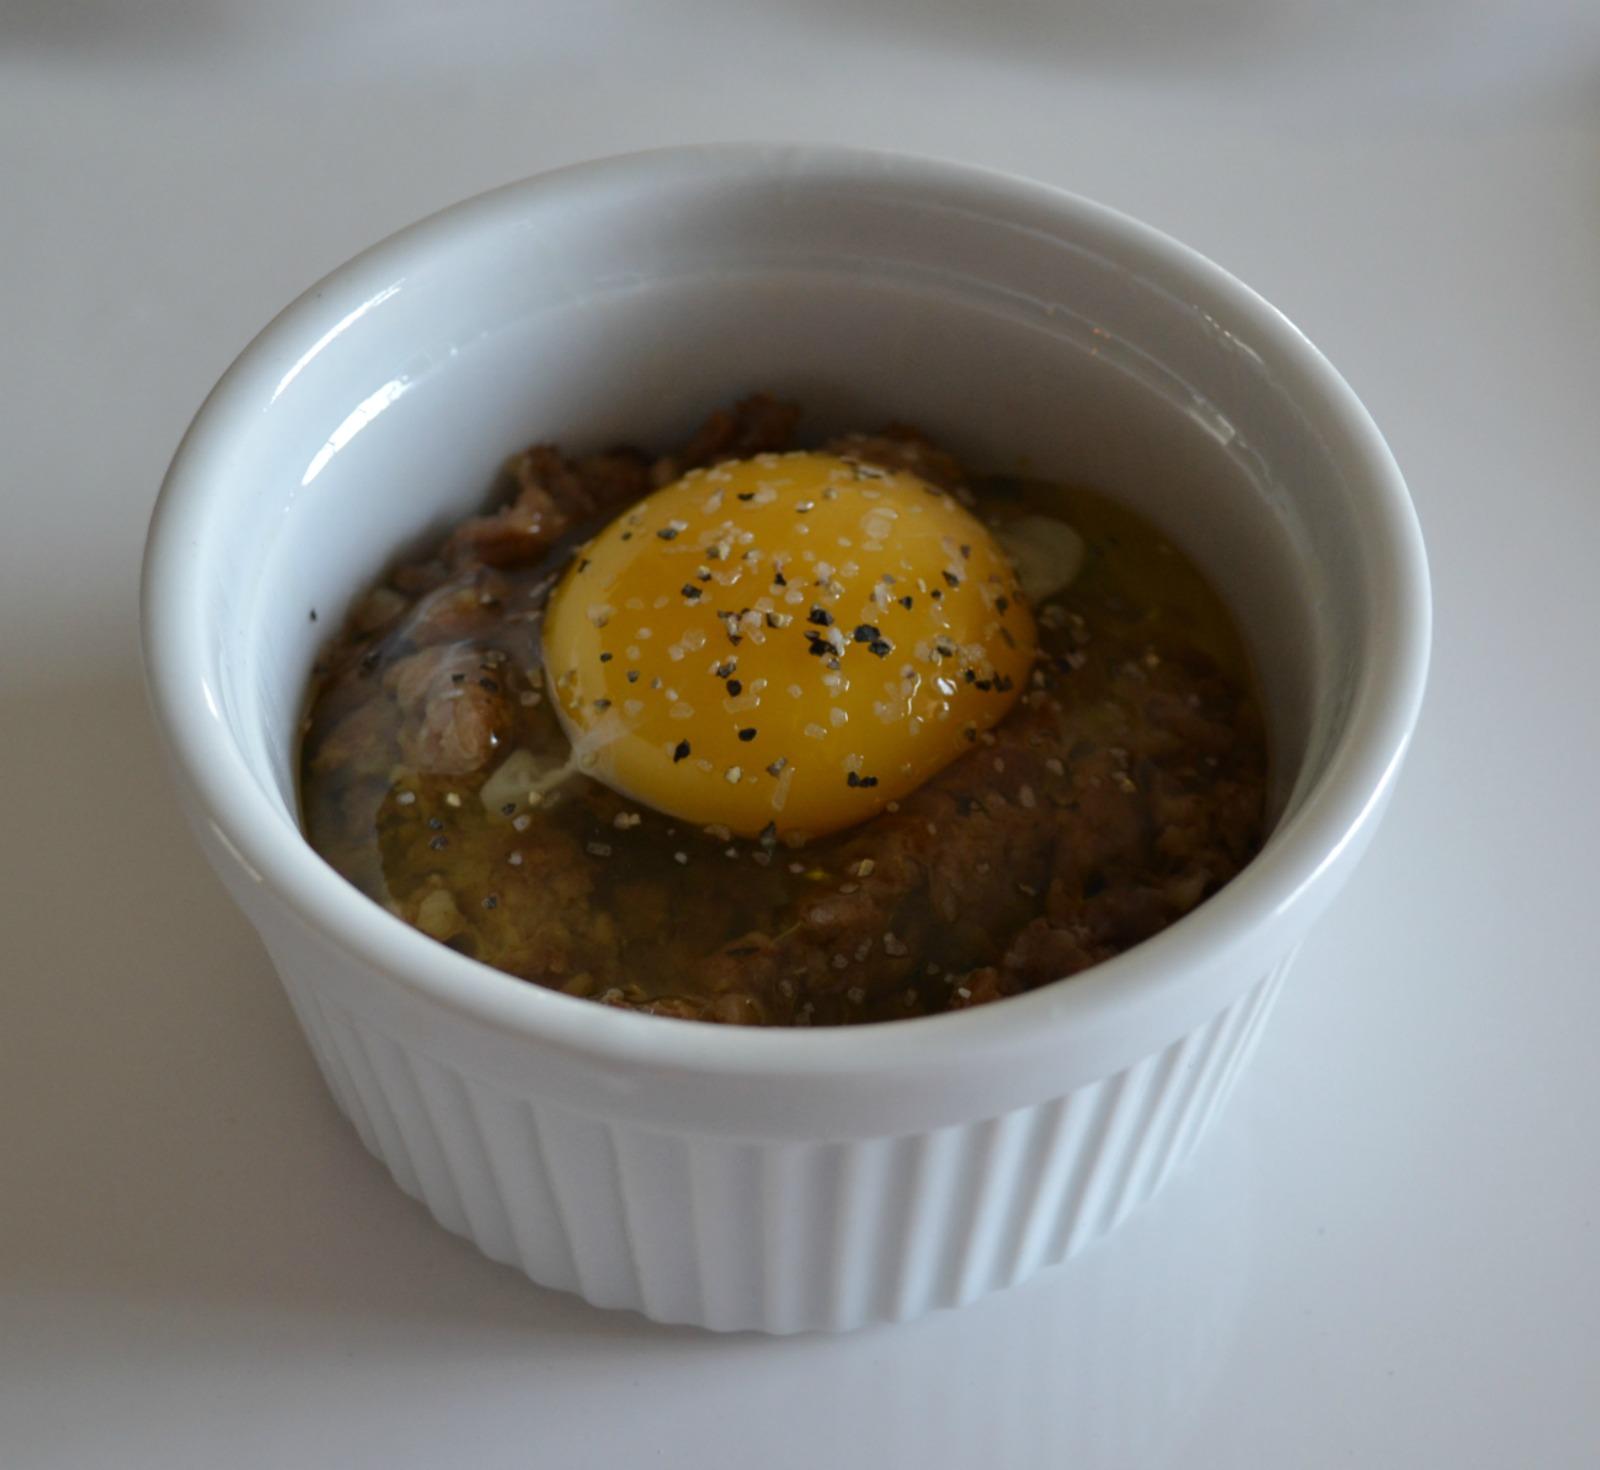 breakfast, baked eggs, sausage, ramekin, st patrick's day